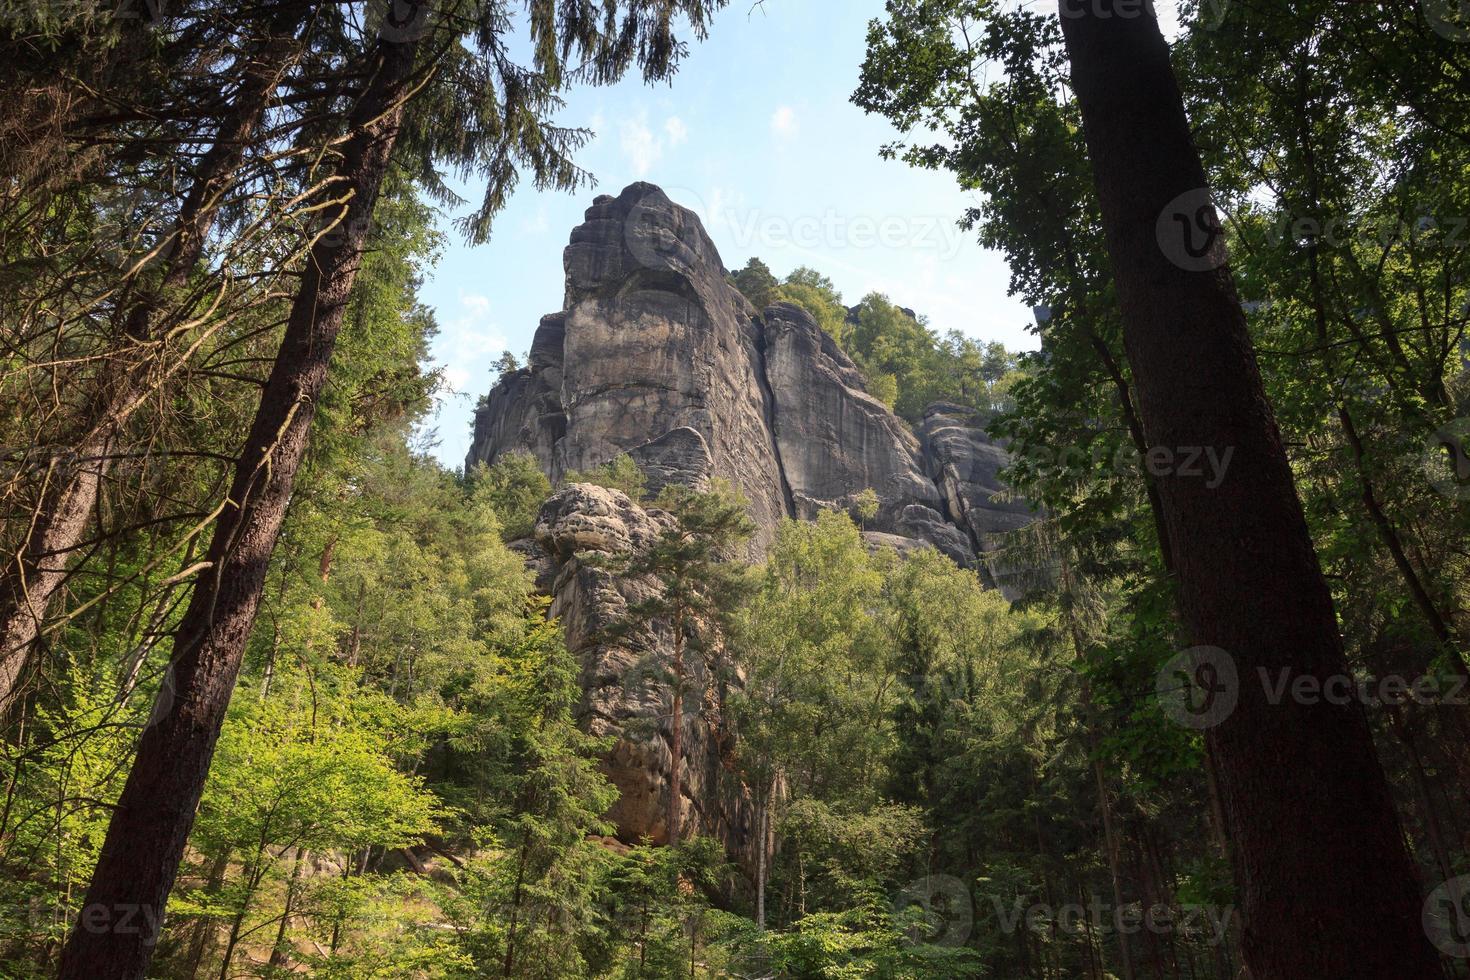 schrammsteine rock na Suíça saxã foto